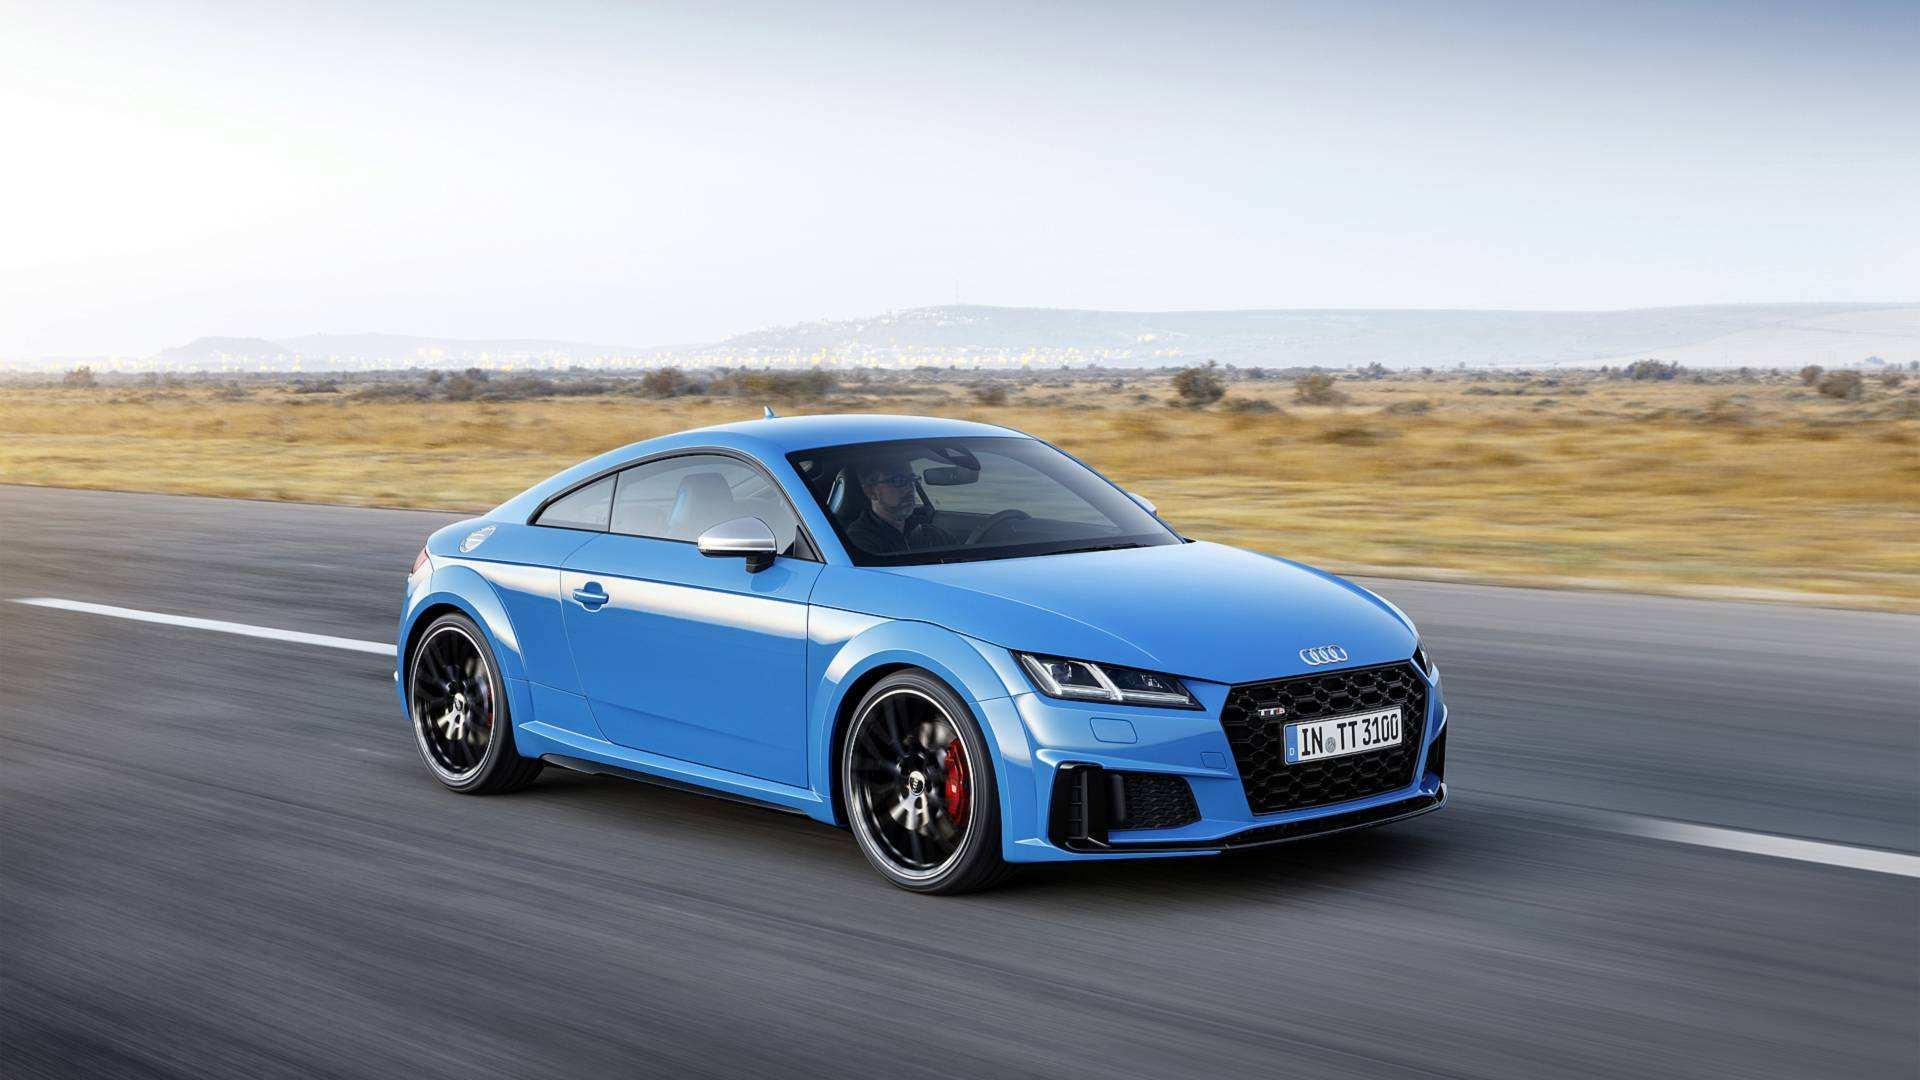 24 Concept of The Audi Tt Convertible 2019 Concept Spy Shoot by The Audi Tt Convertible 2019 Concept